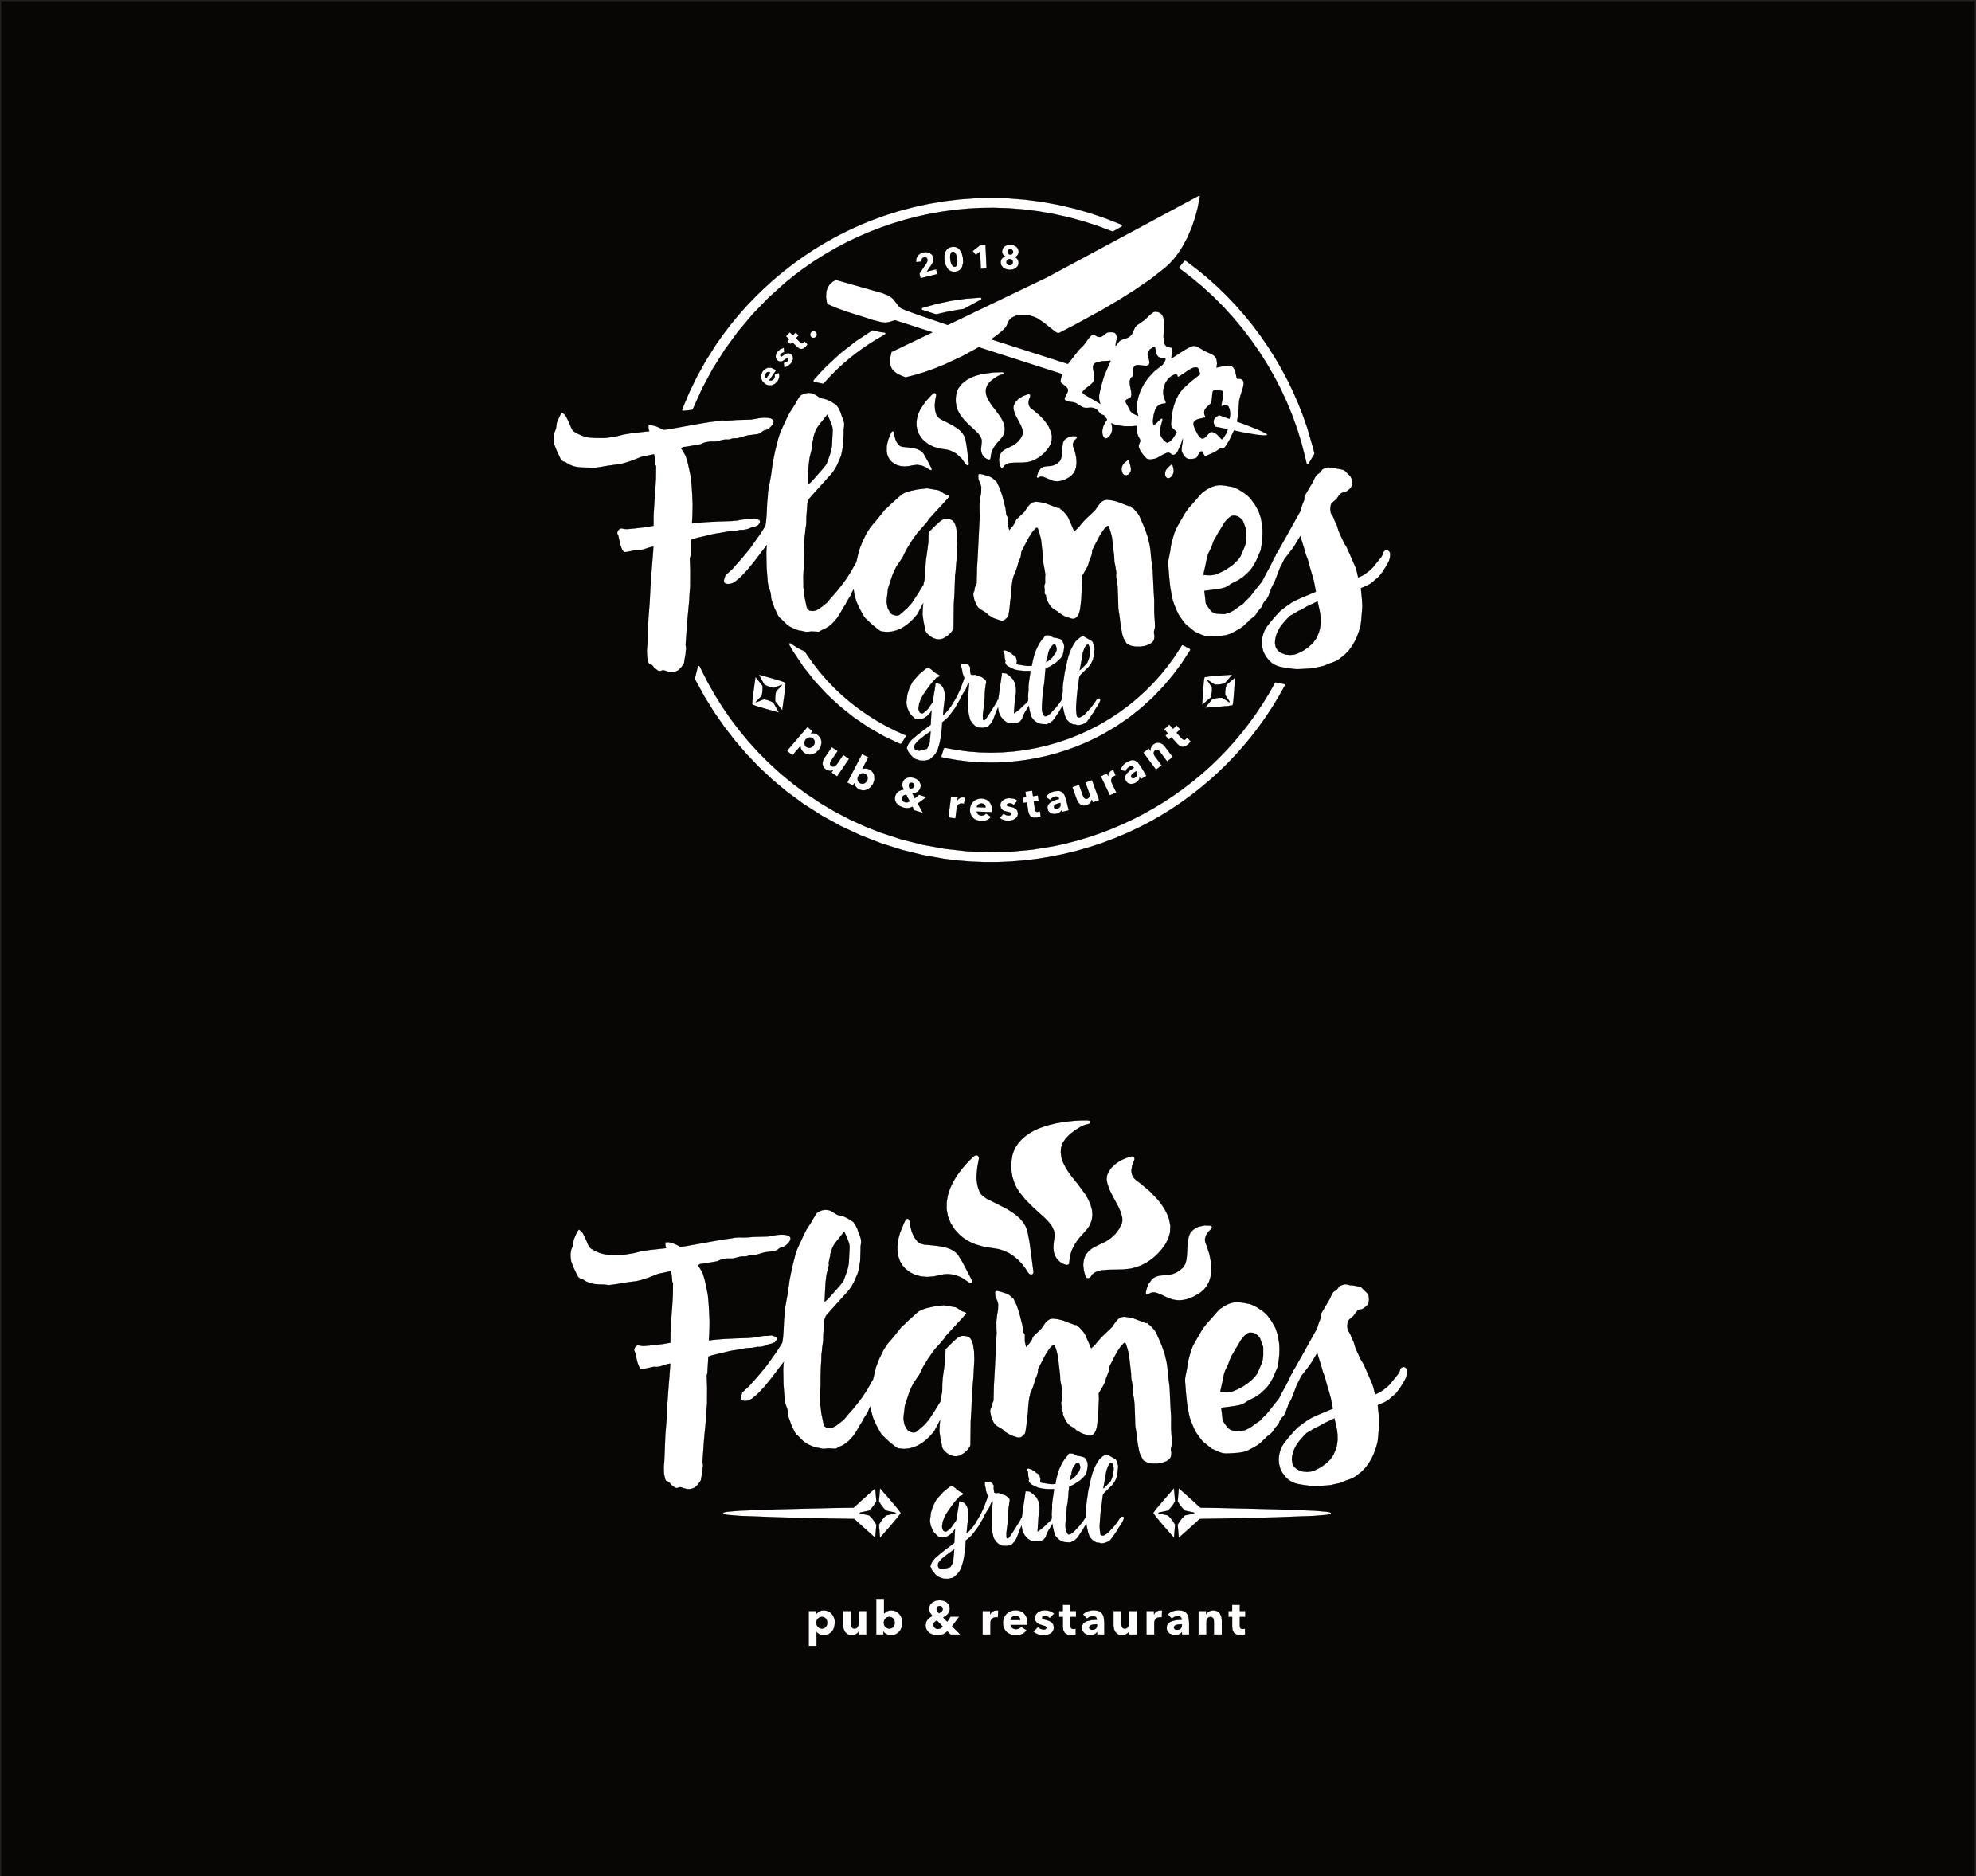 sono-flames-logo_v10_002